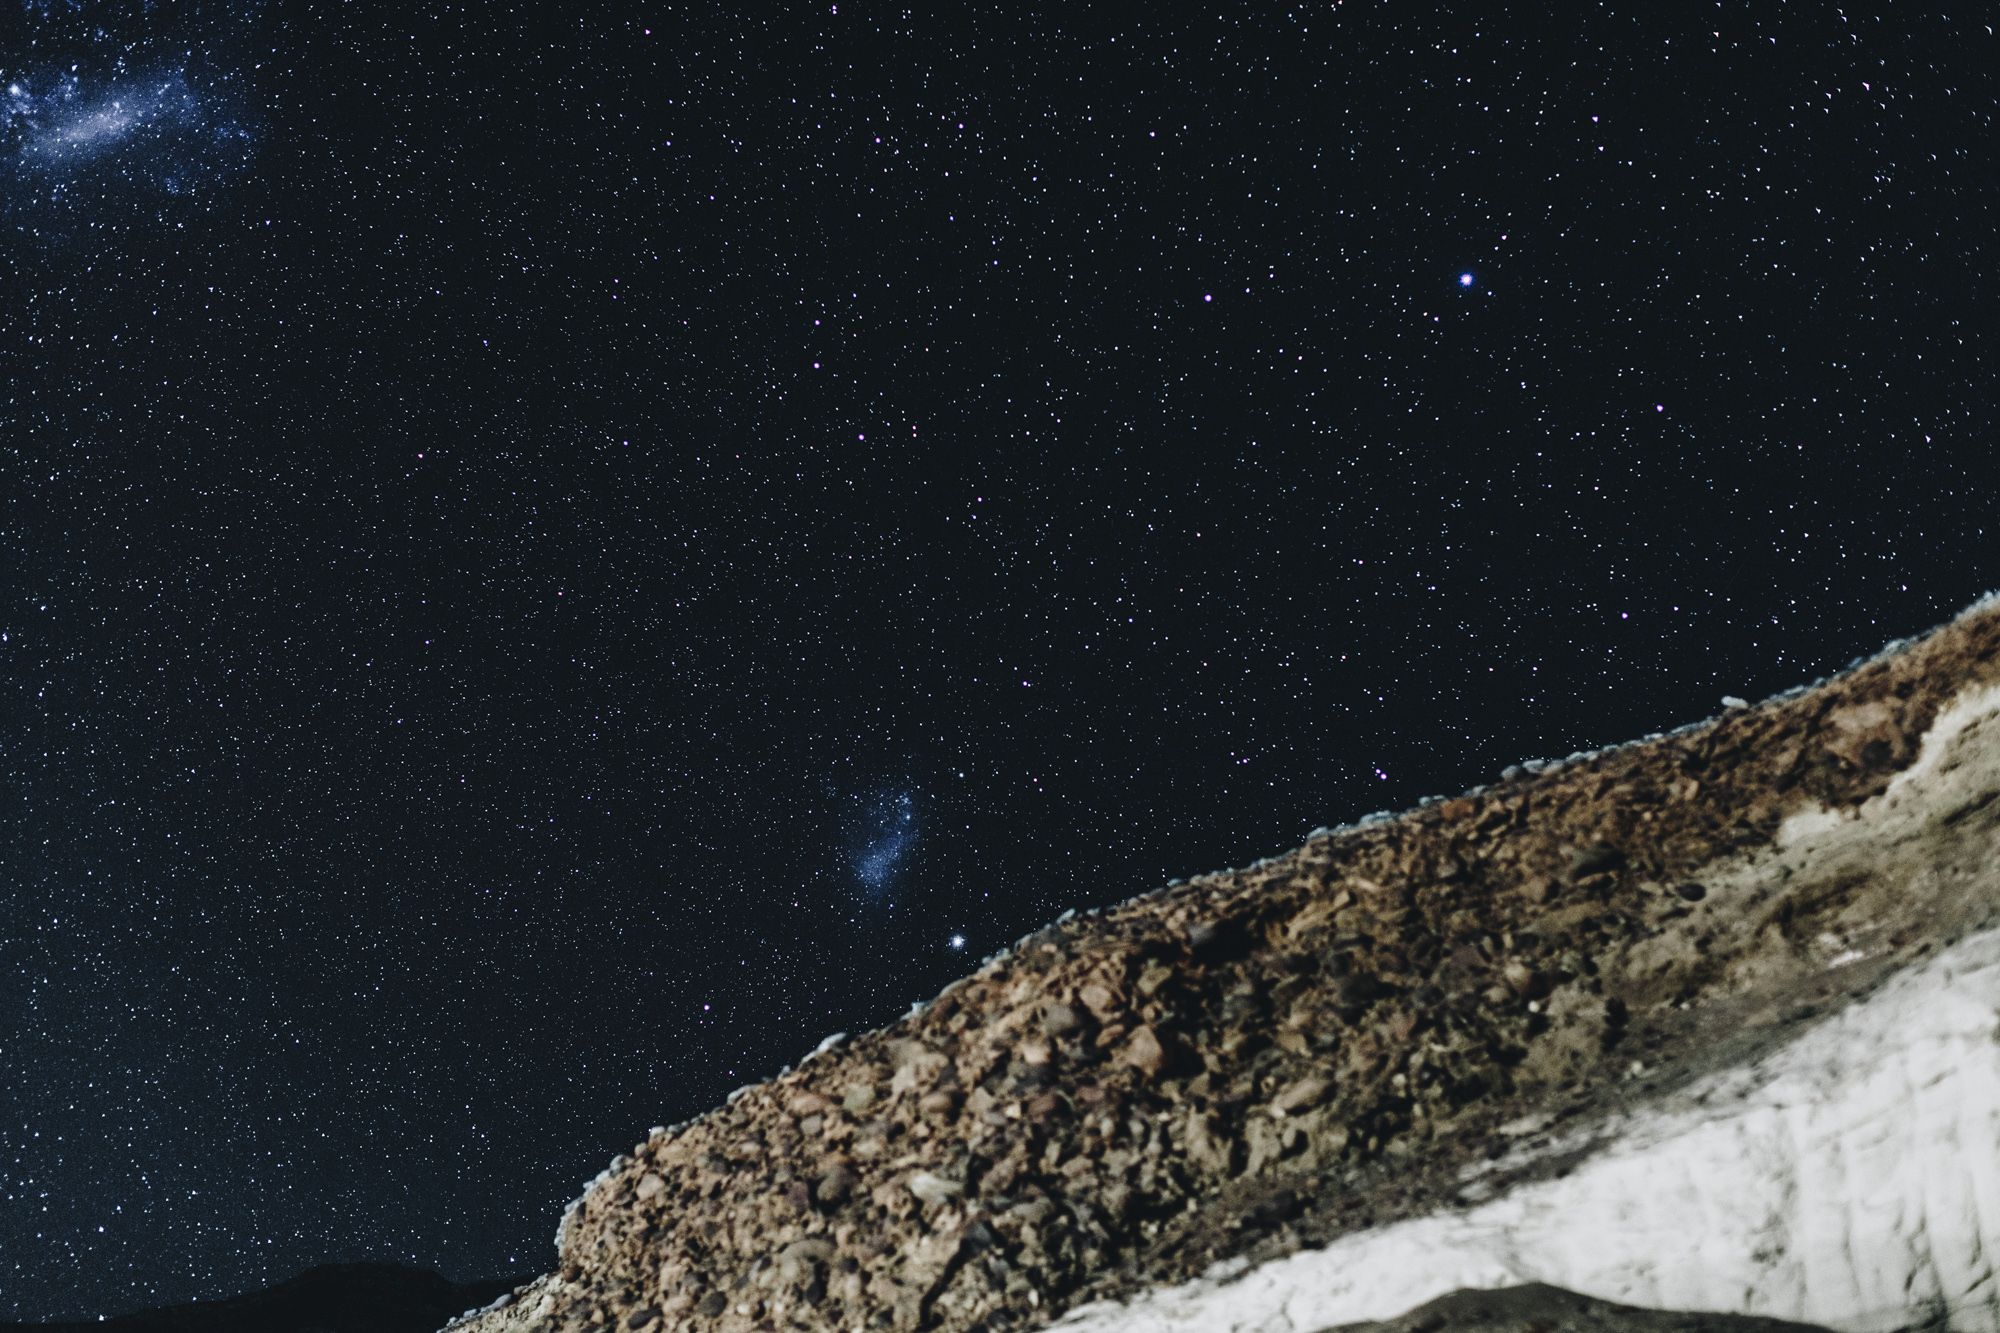 Mael Lambla photographer Chile San pedro atacama desert-7.jpg